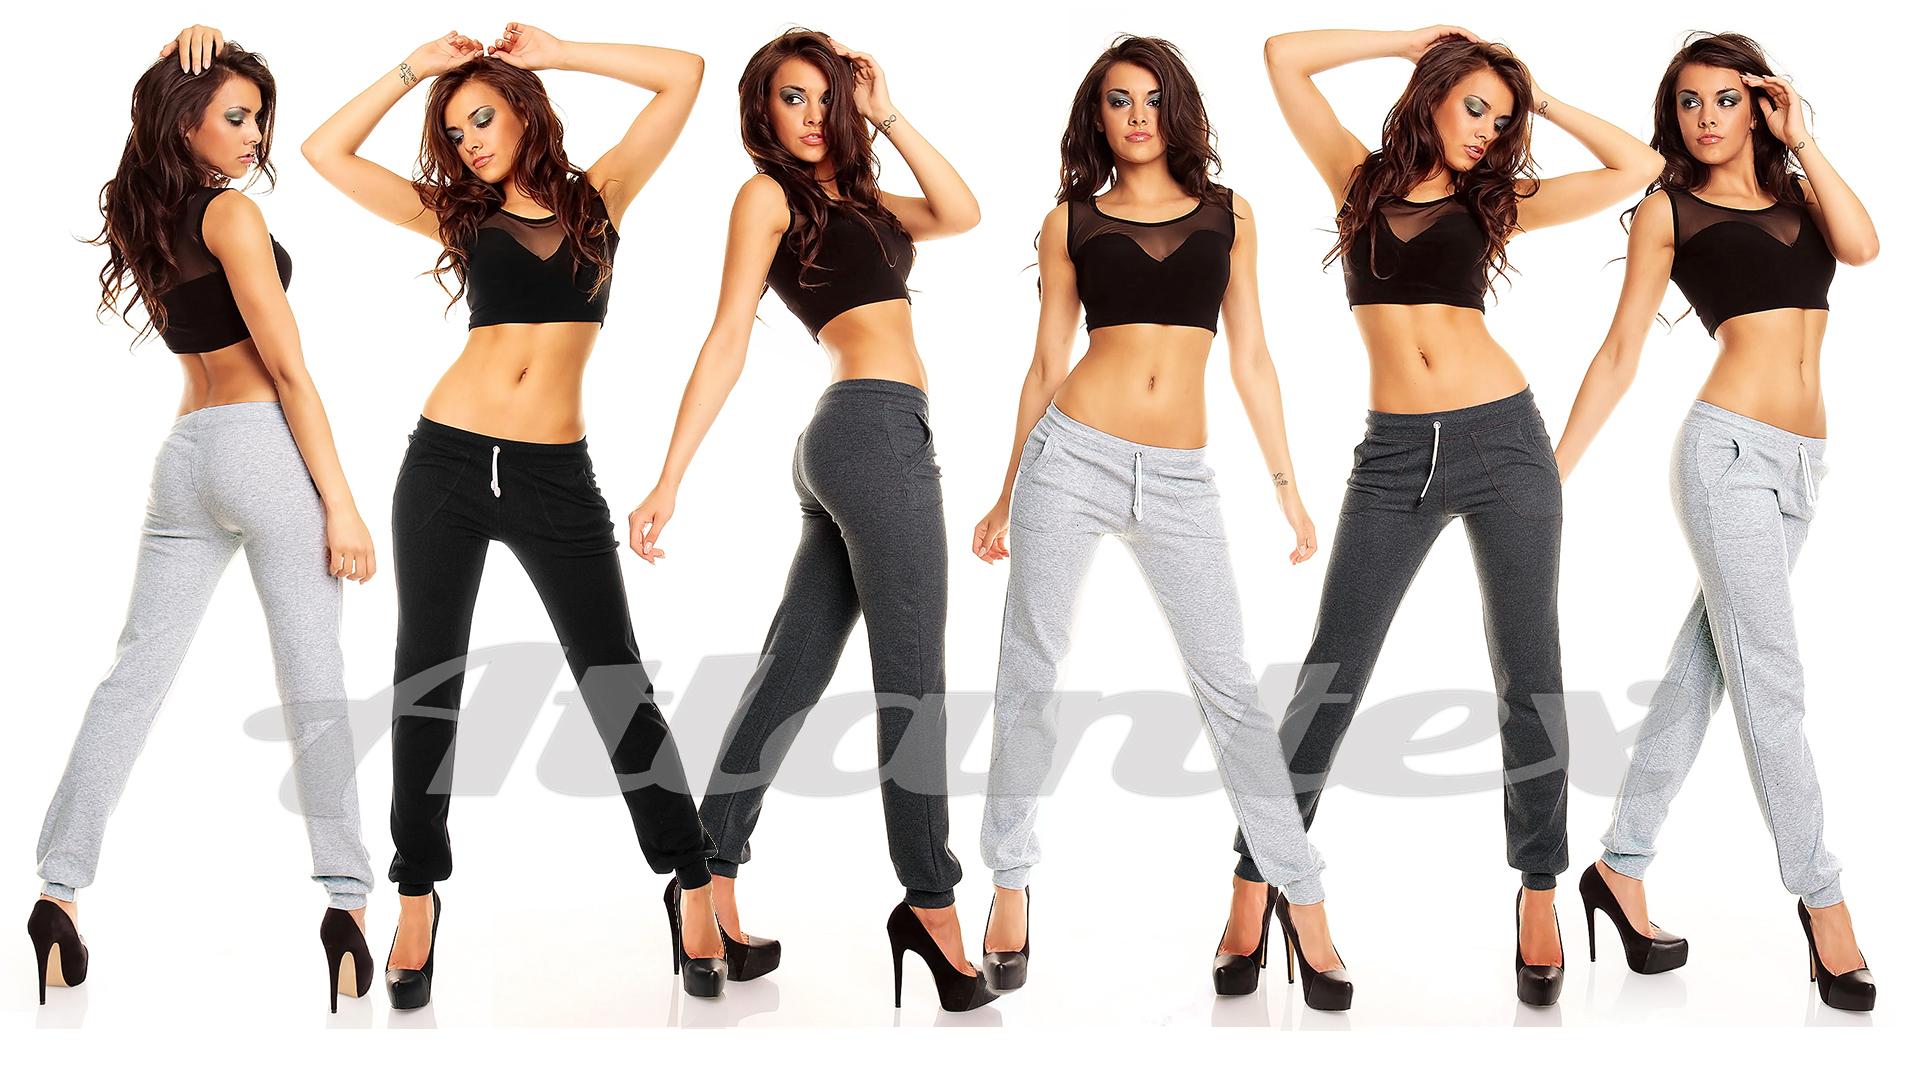 Spodnie dresowe - Atlantex.com.pl